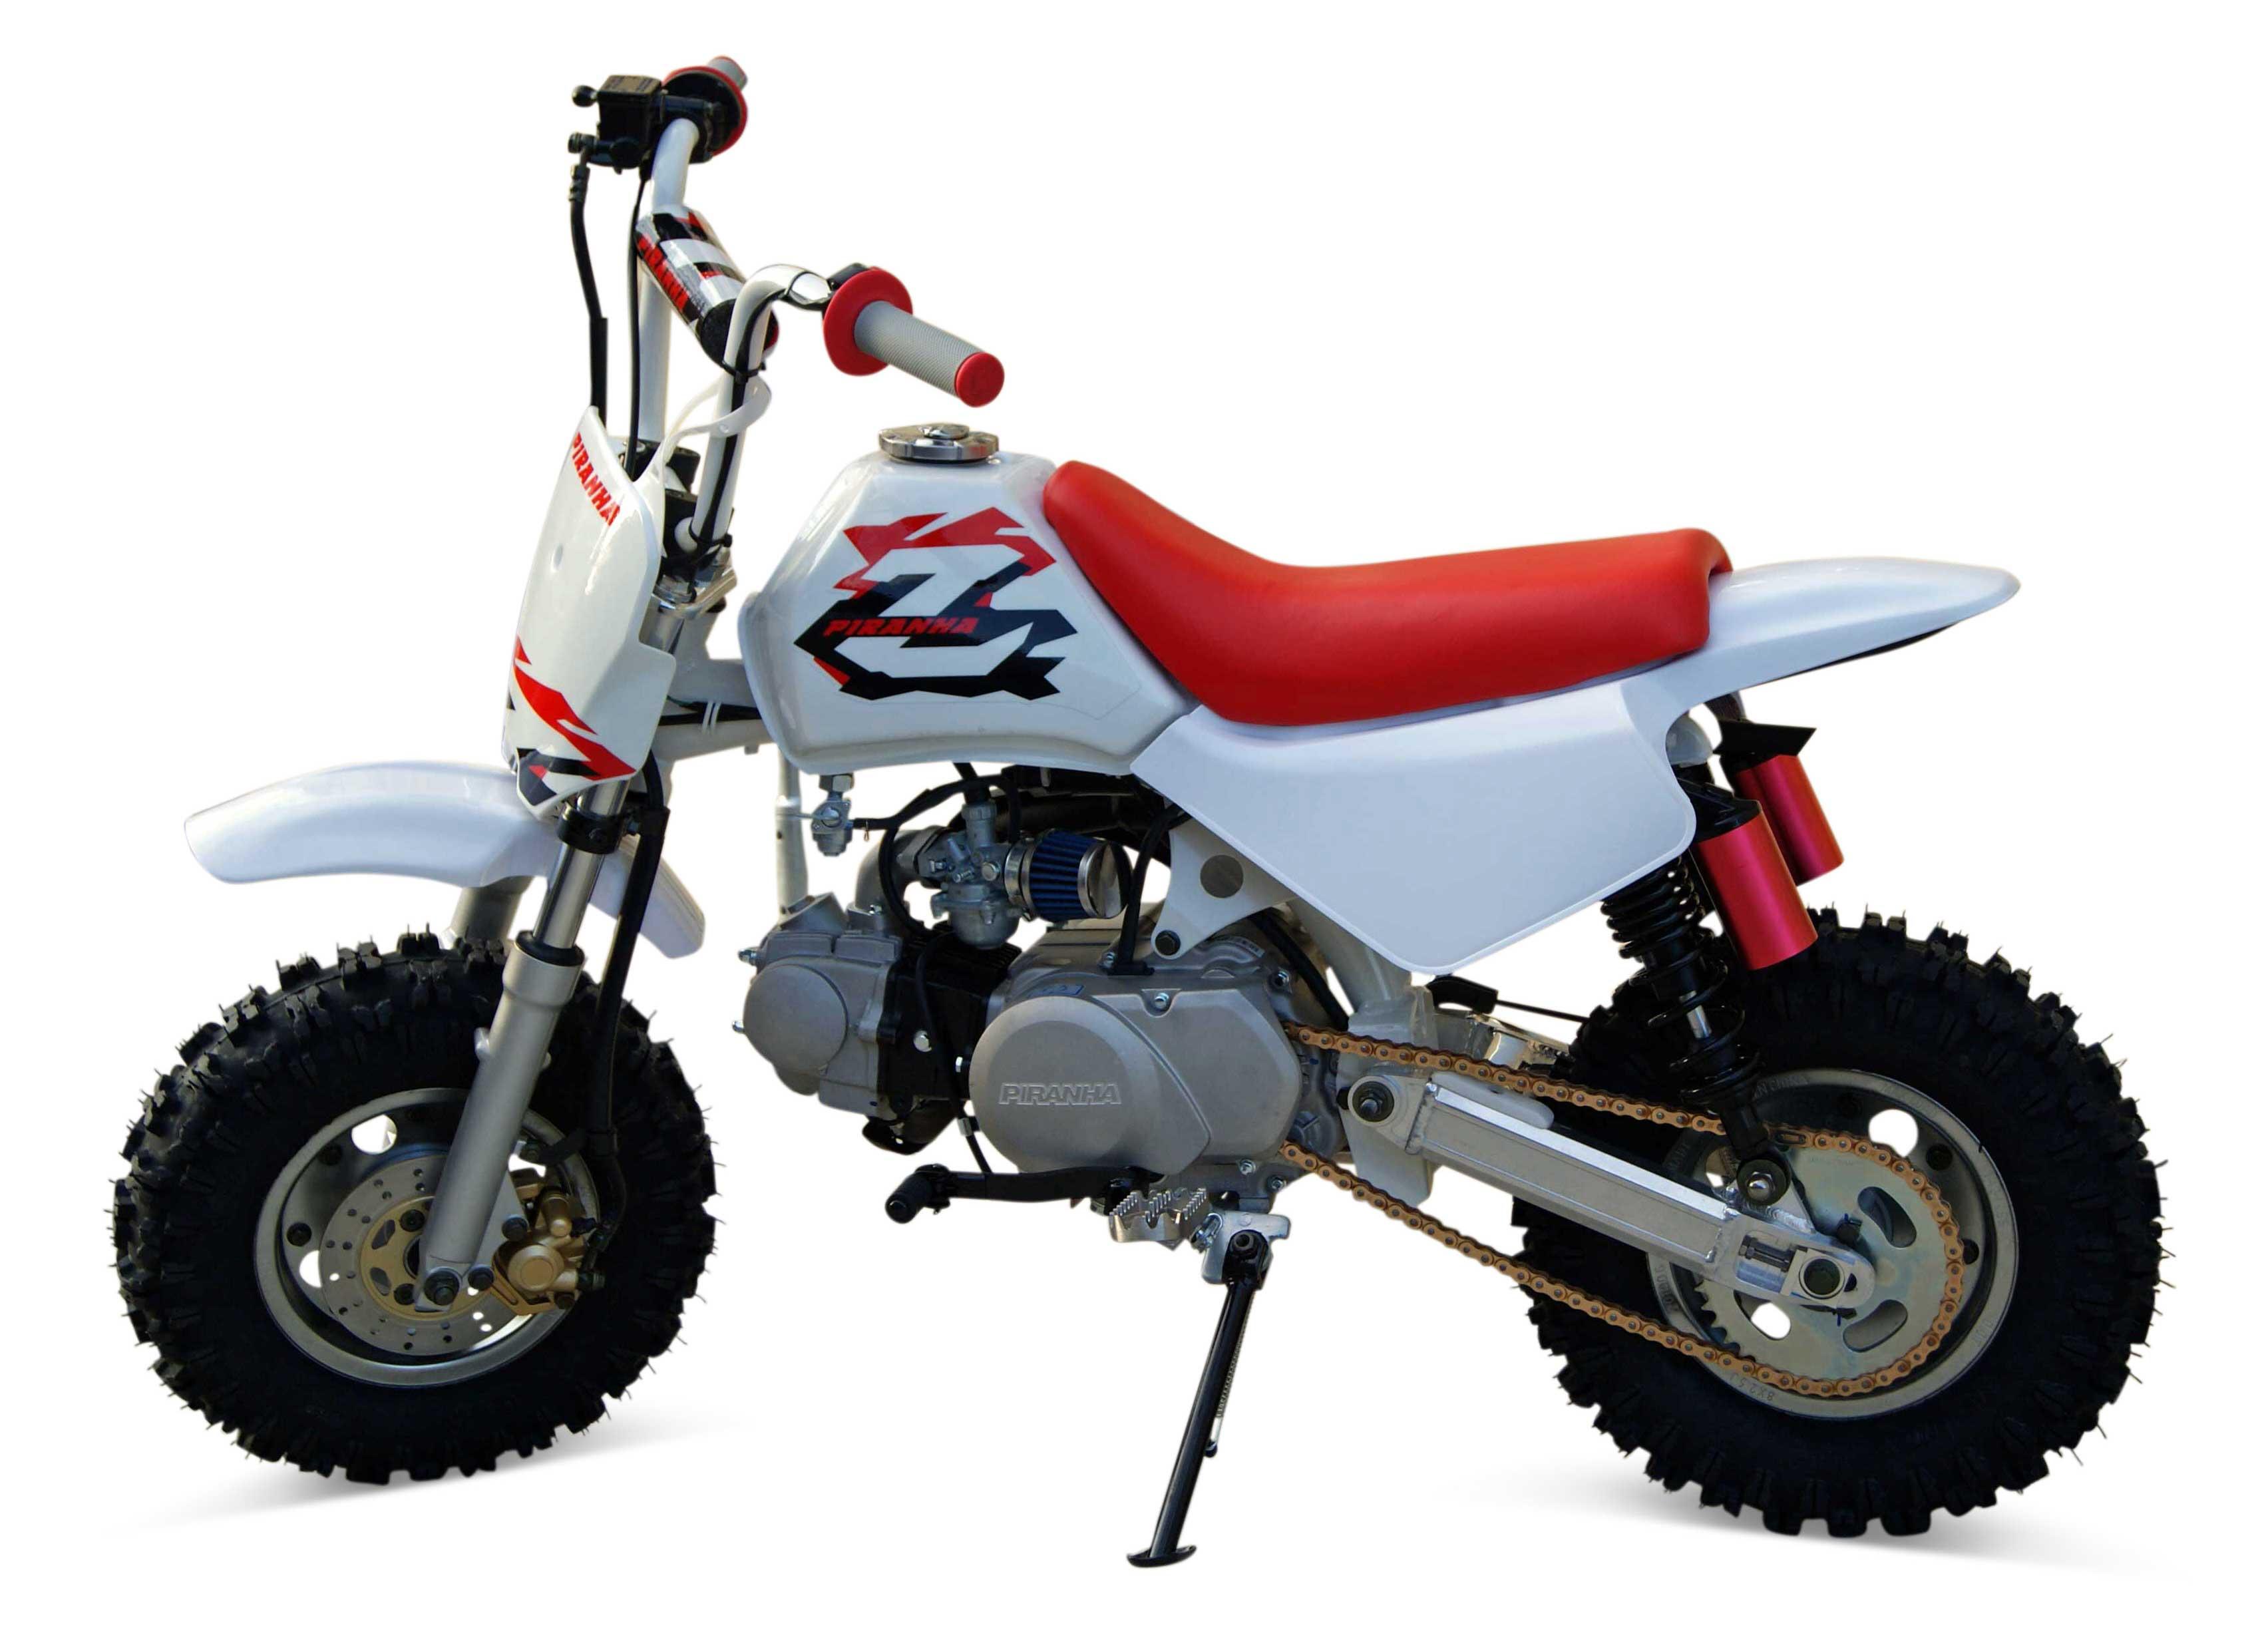 hight resolution of piranha zr pit bike